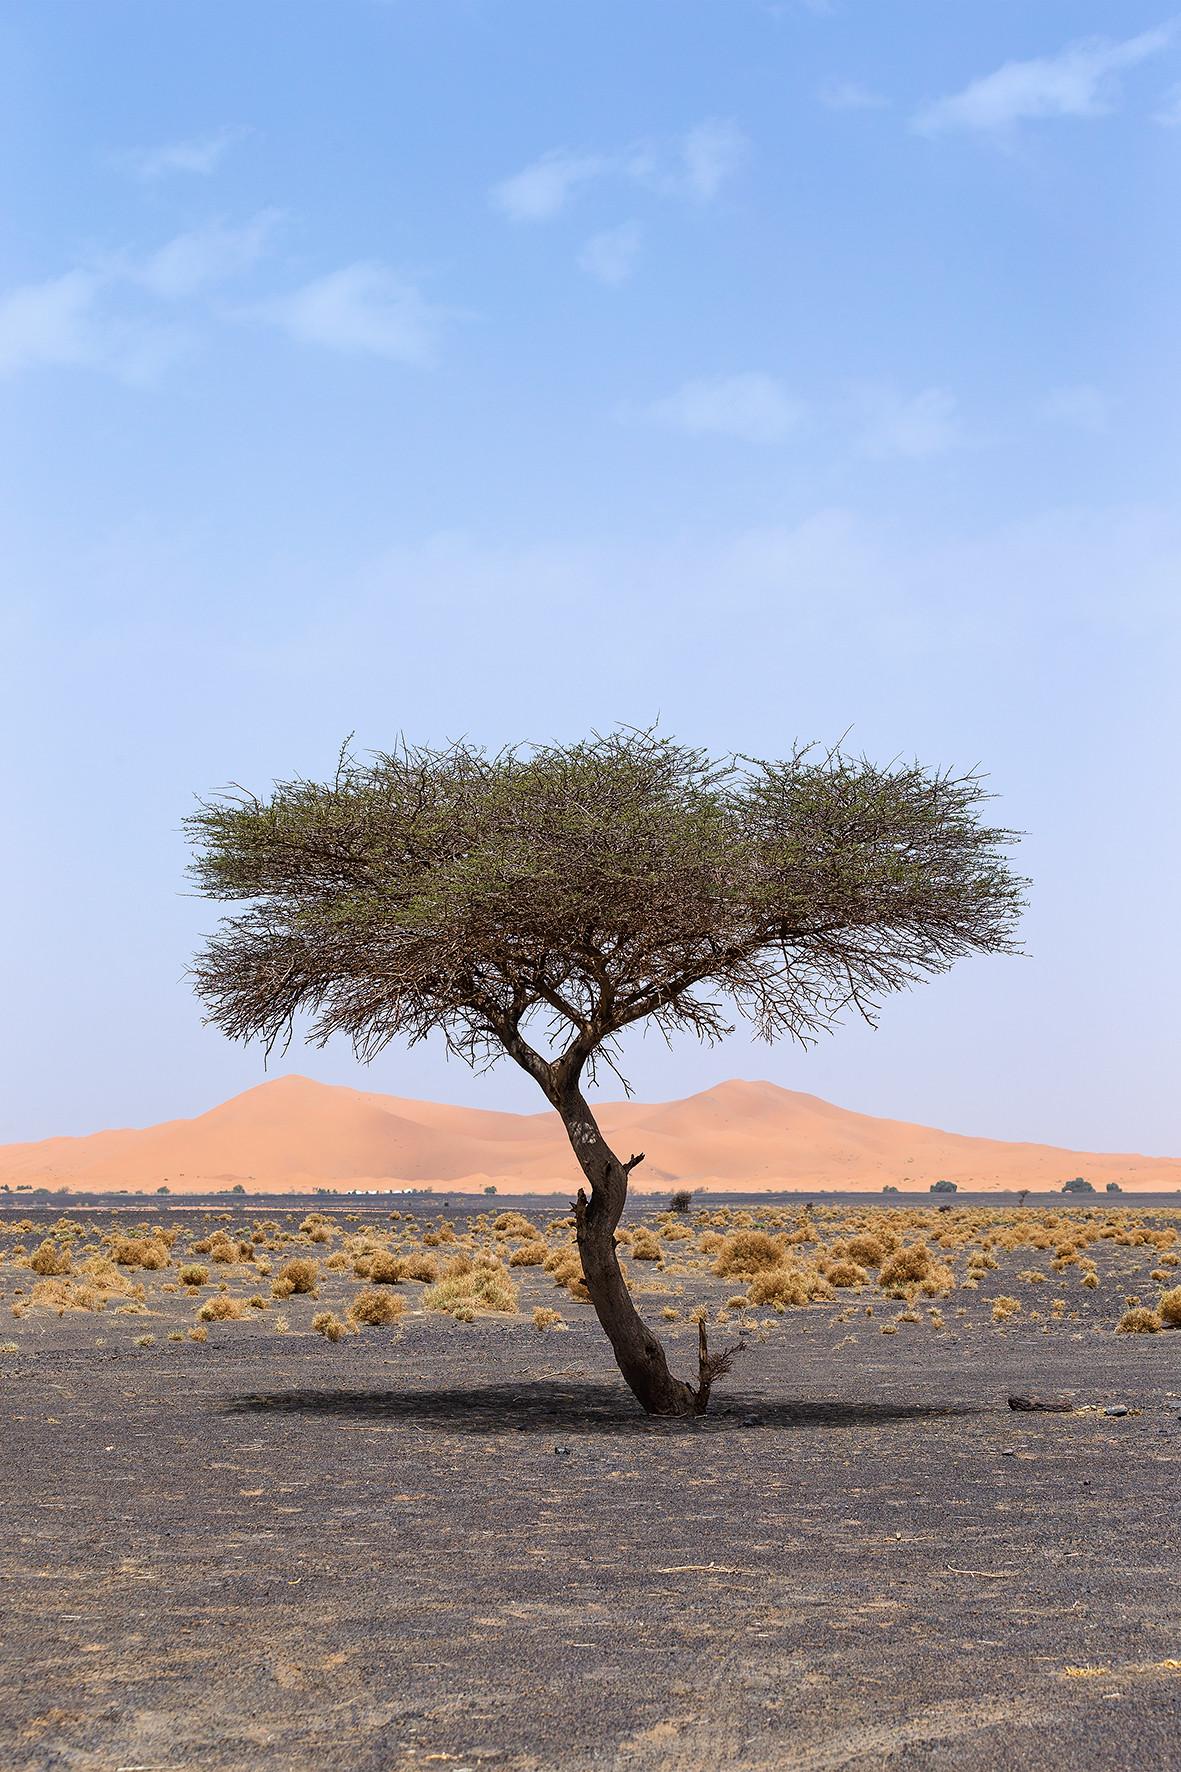 Trees-Landscape-Nature-Best-Contemporary